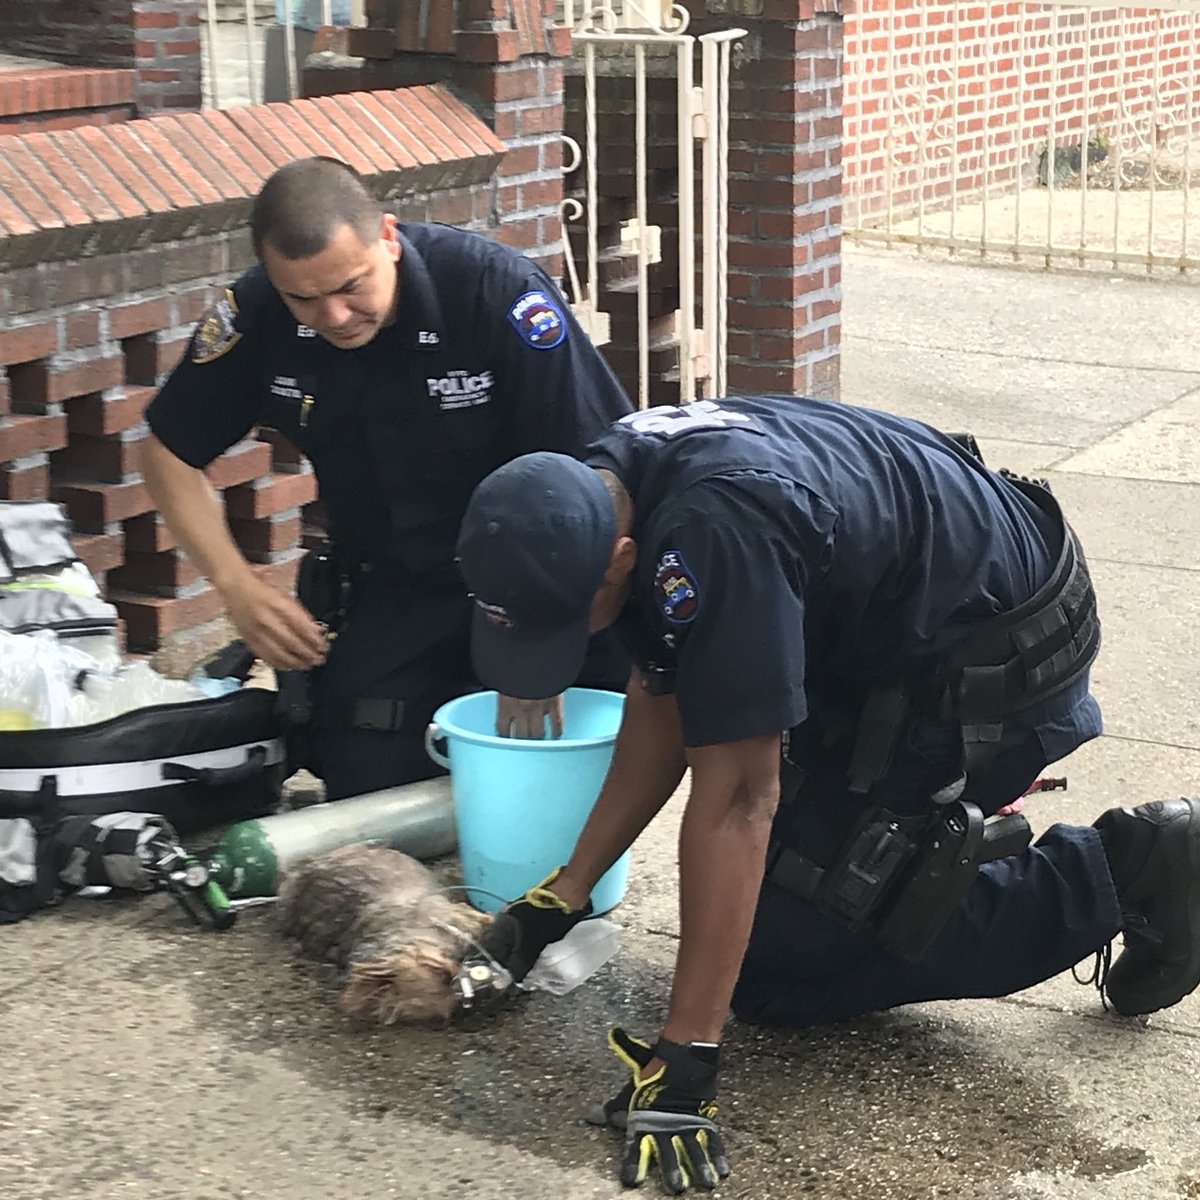 NYPDnews photo